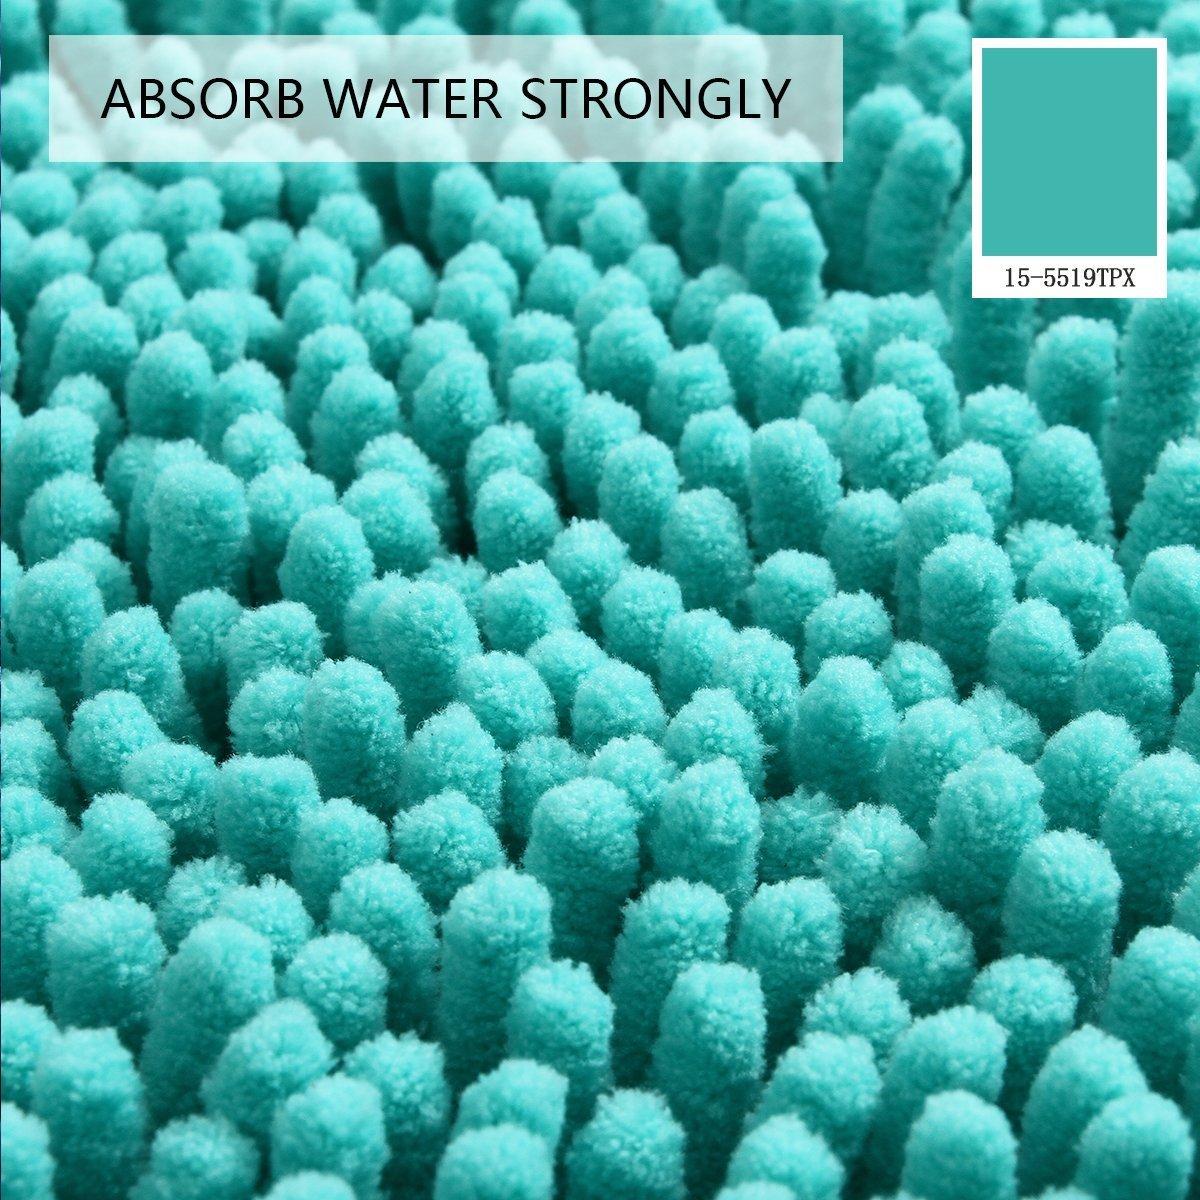 Mayshine Bath mats for Bathroom Rugs Non Slip Machine Washable Soft Microfiber 2 Pack (20×32 inches, Turquoise) by MAYSHINE (Image #1)